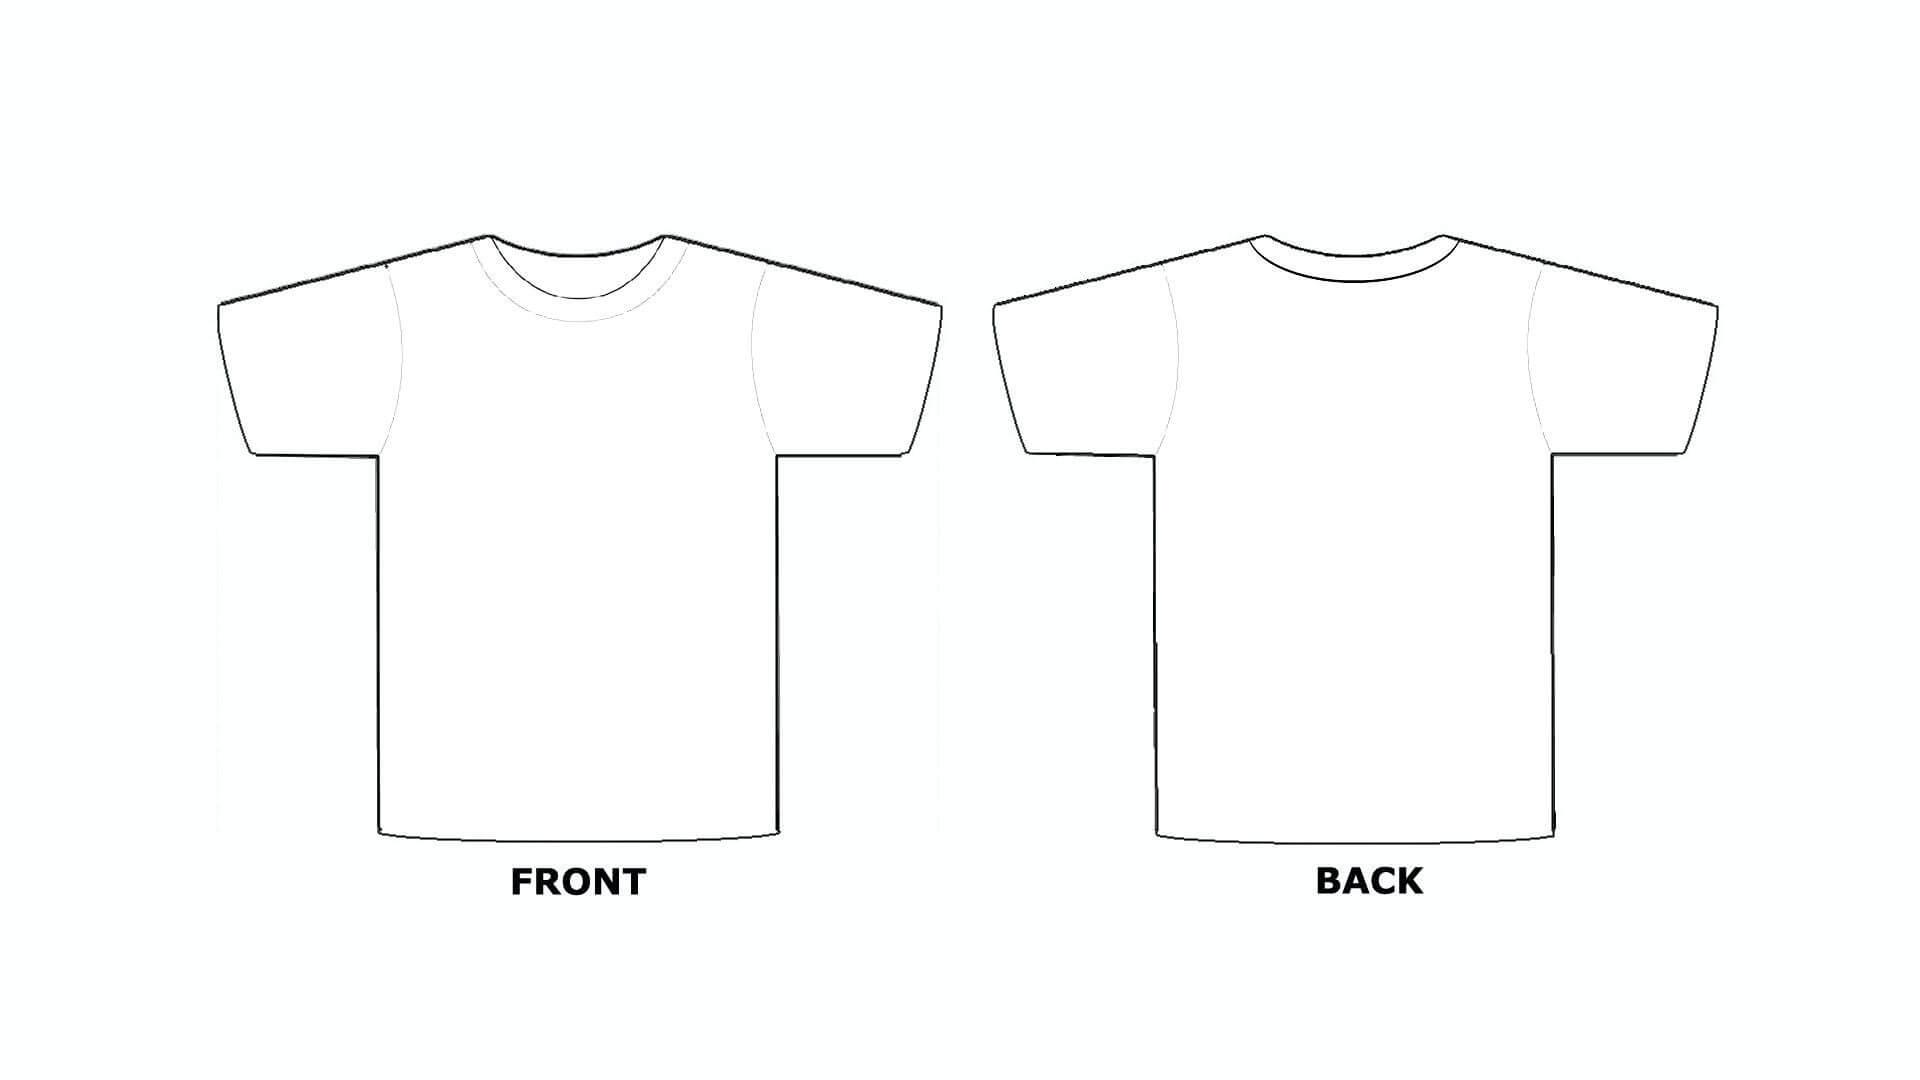 Printable Blank Tshirt Template - C Punkt Pertaining To Blank Tshirt Template Printable